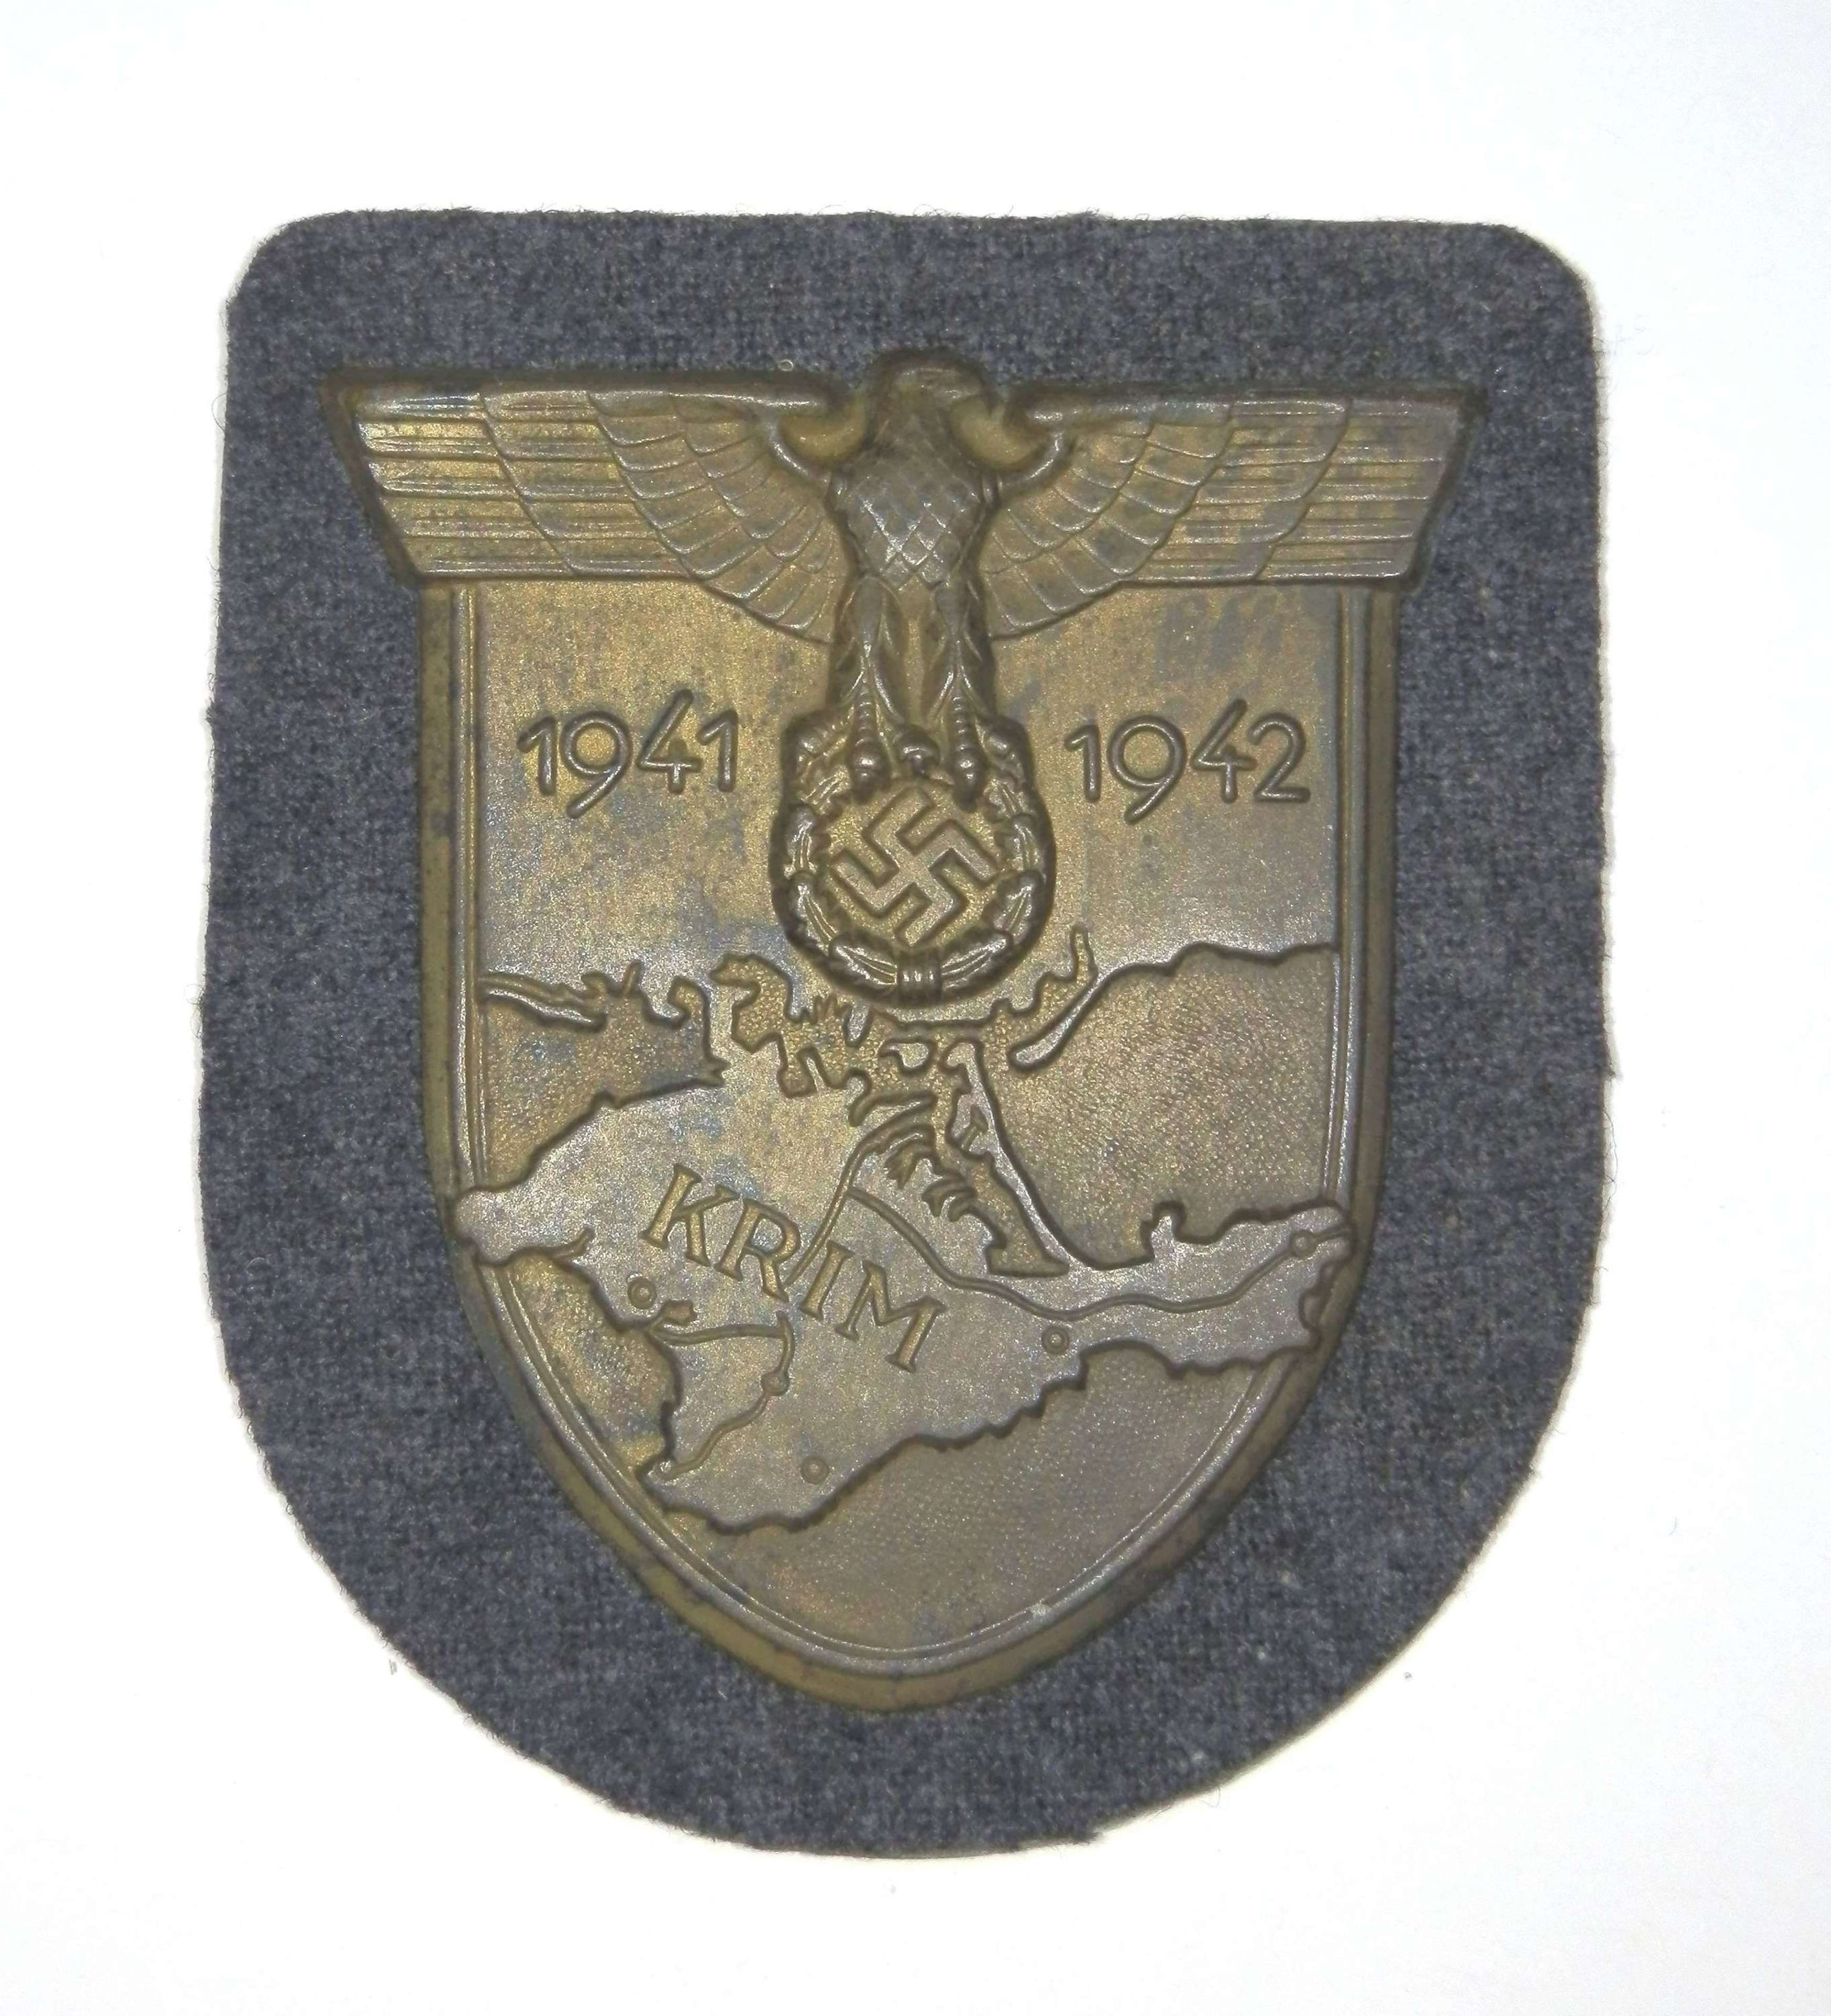 Crimea Shield, Luftwaffe issue.